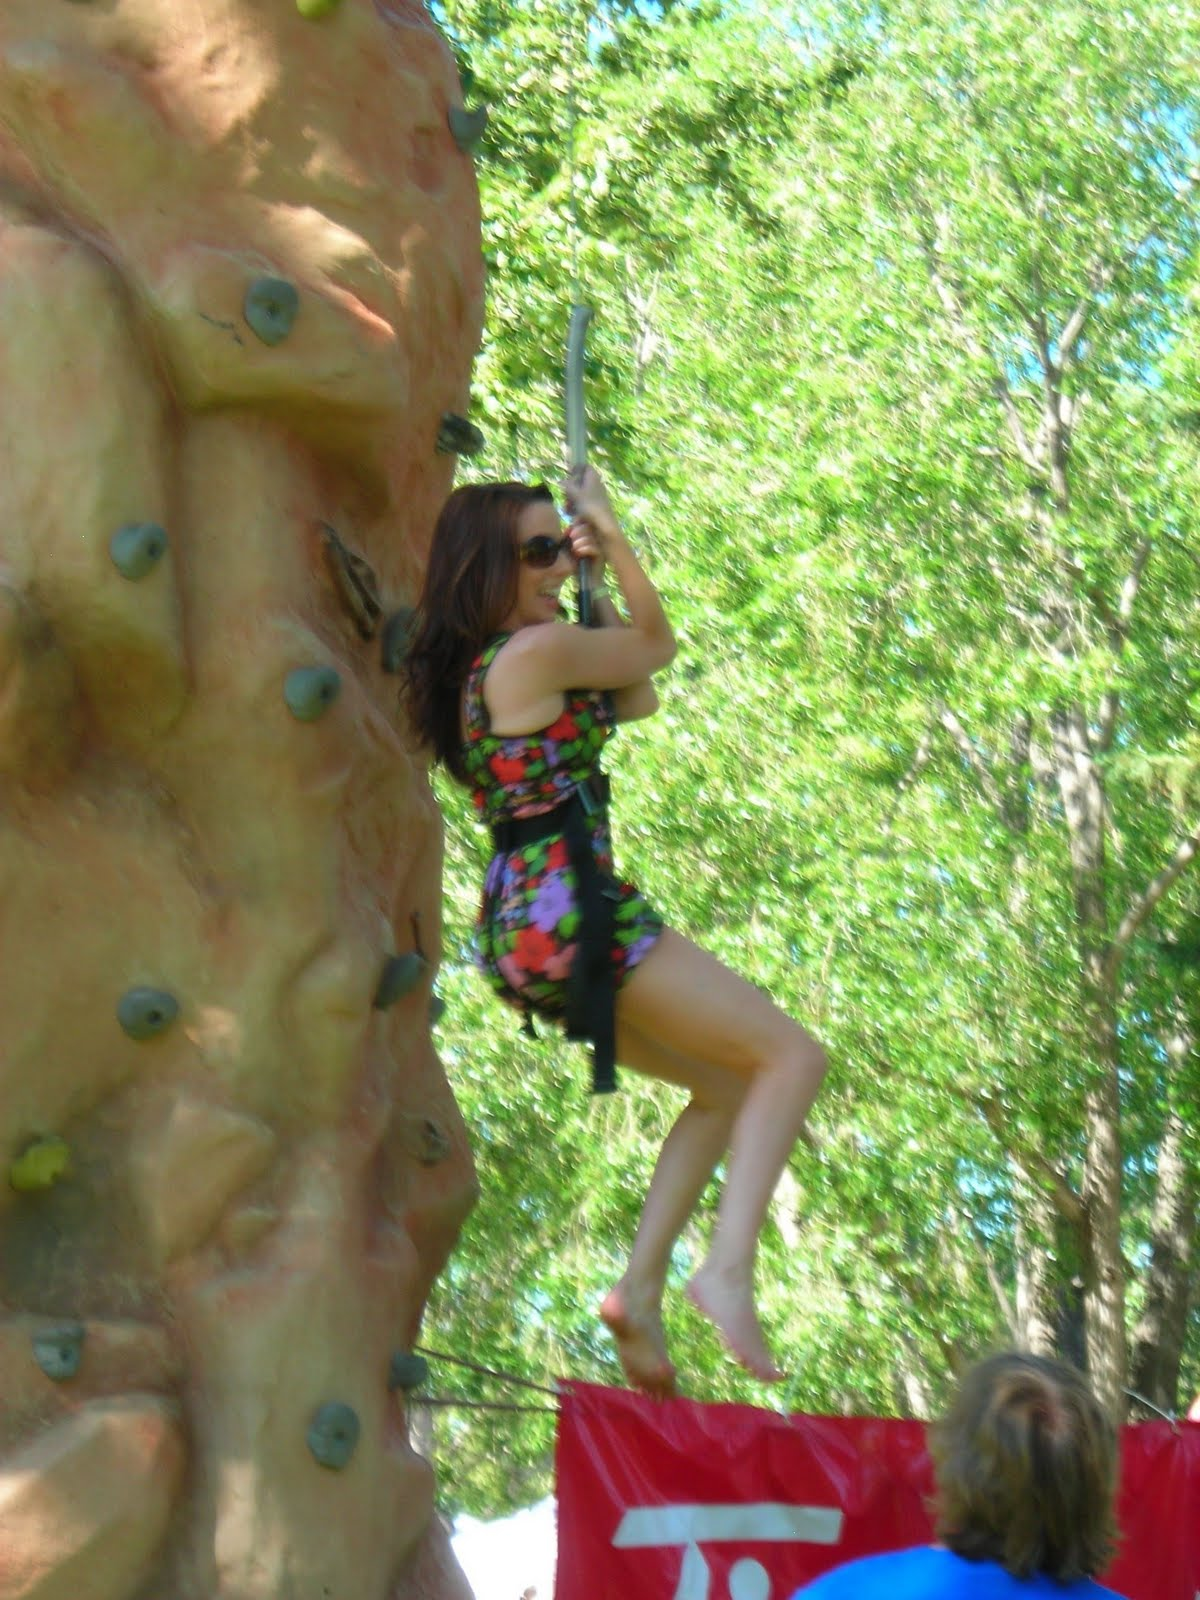 http://2.bp.blogspot.com/_bR_ejBscJtM/TGWiVJeSL5I/AAAAAAAABGc/fCtfxlSGmDI/s1600/wall+climb+3.JPG